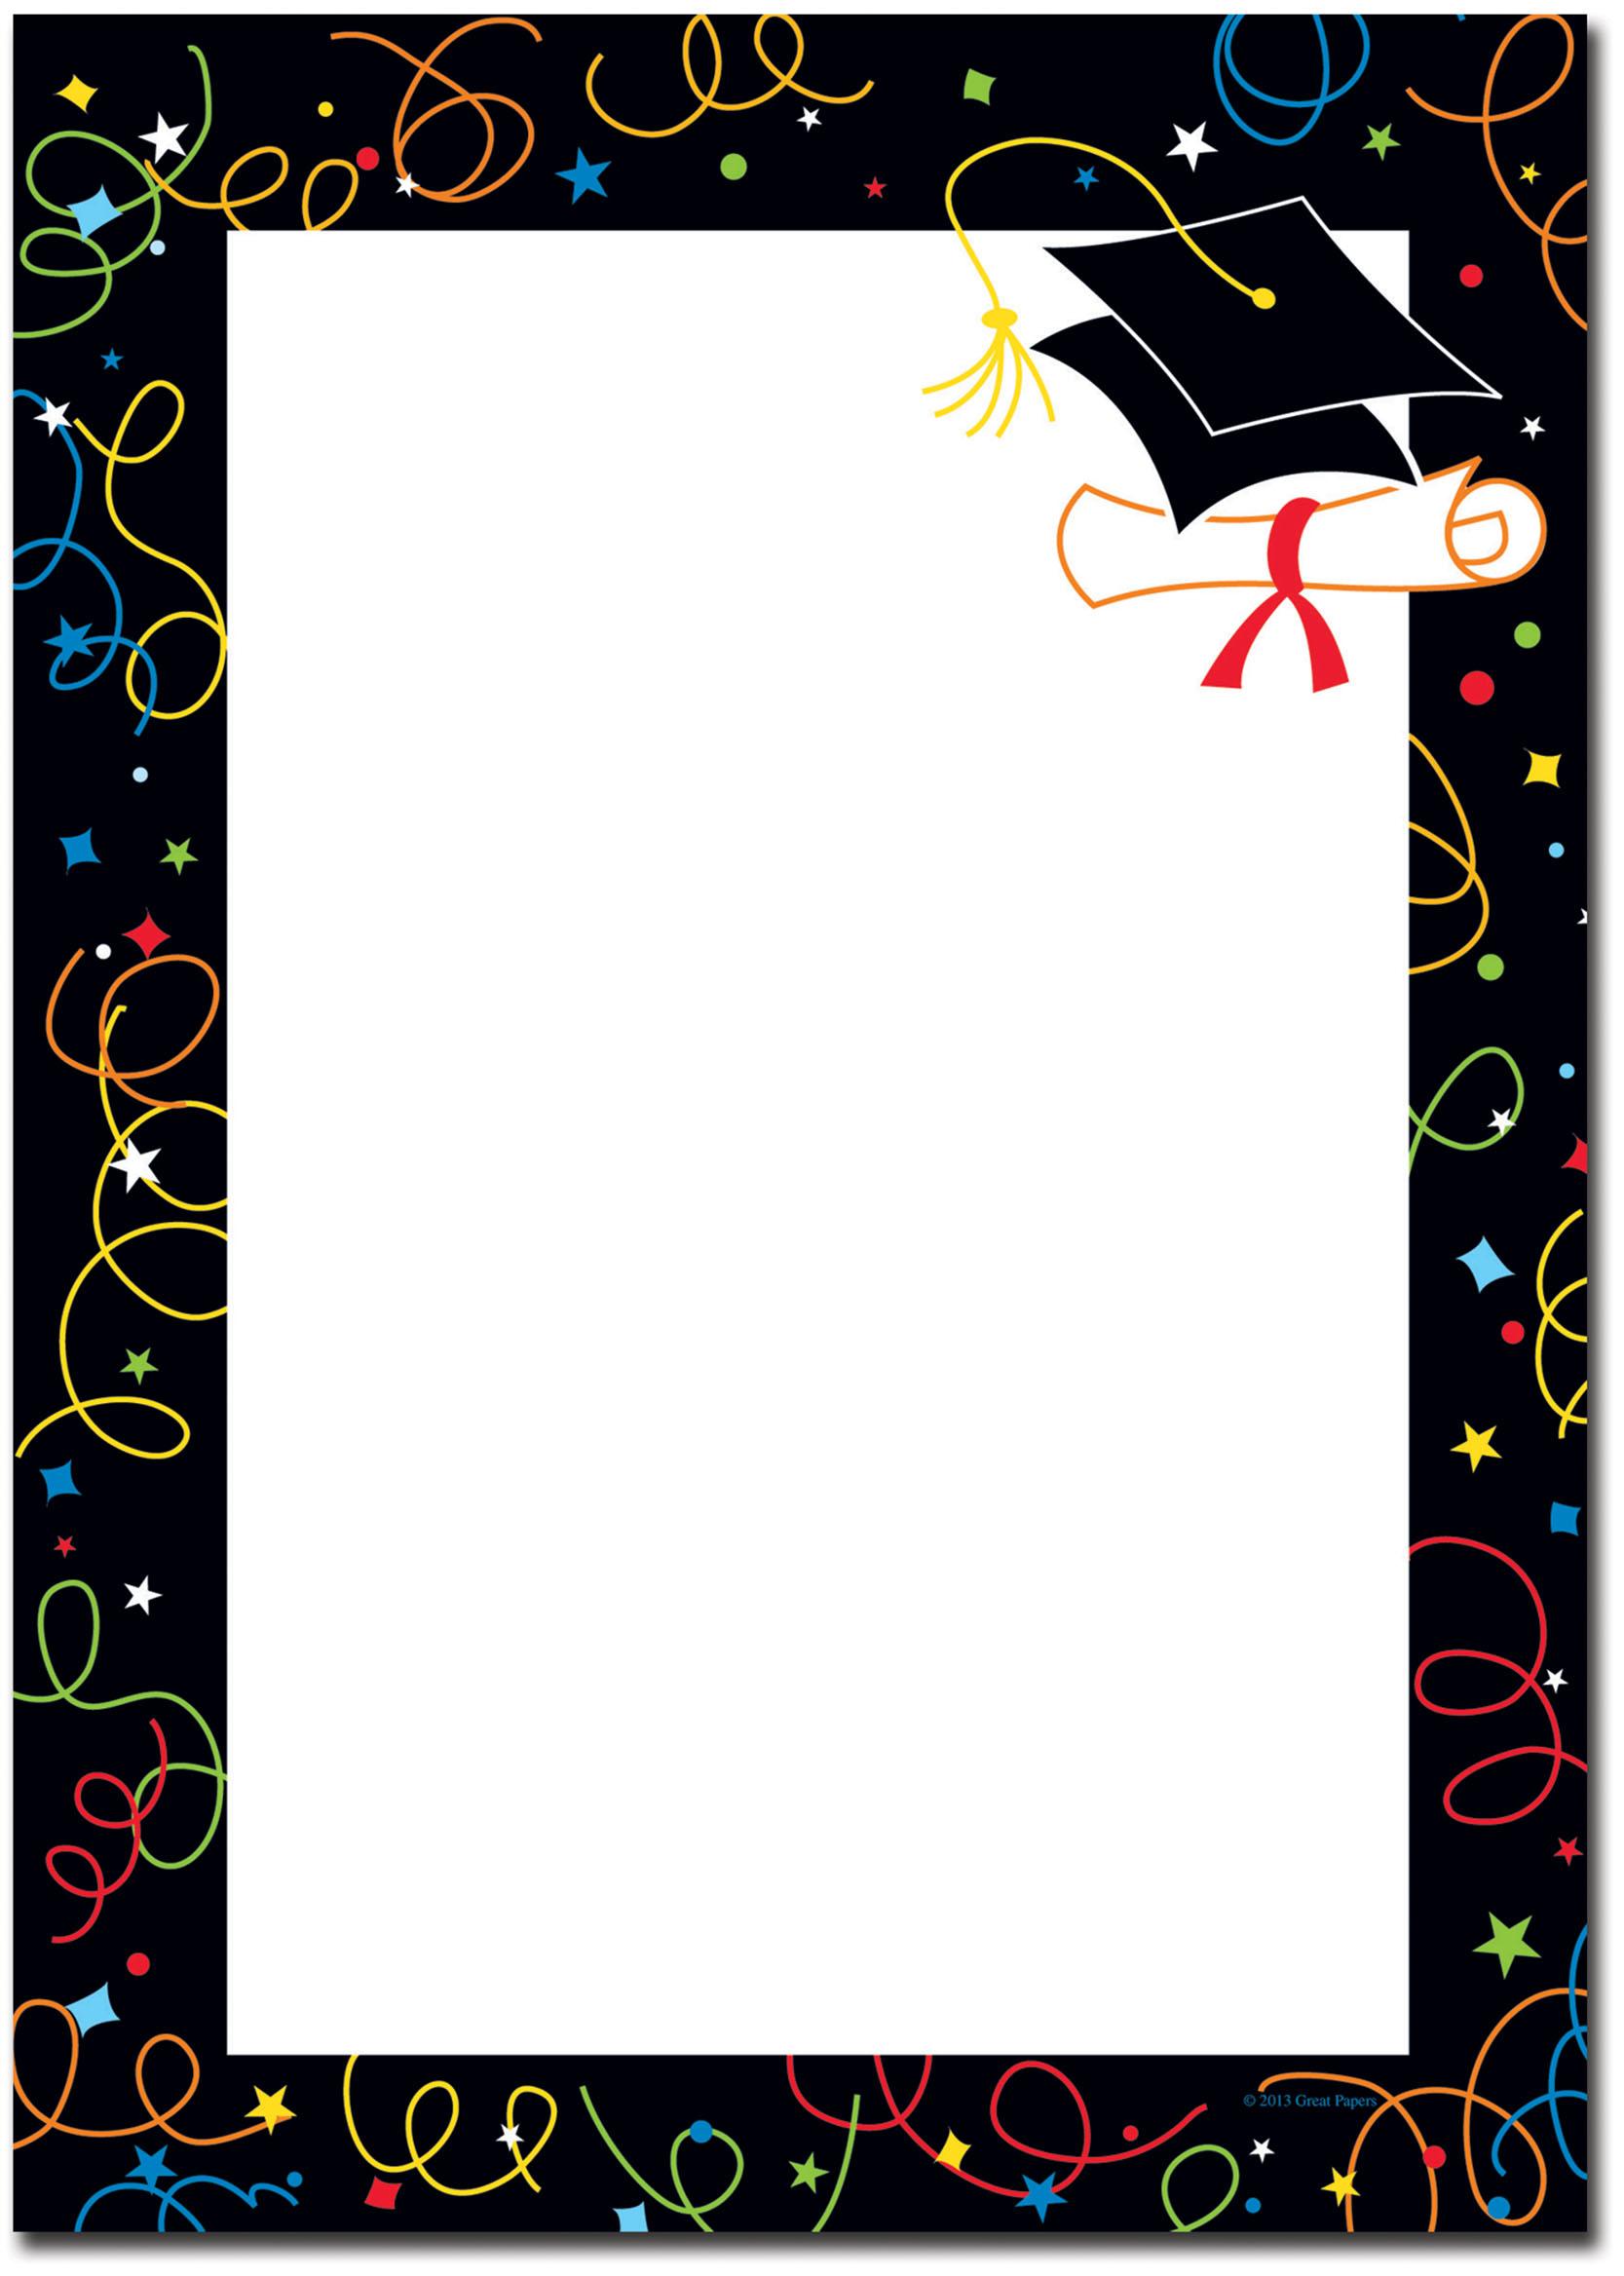 Free printable borders incep. Border clipart graduation